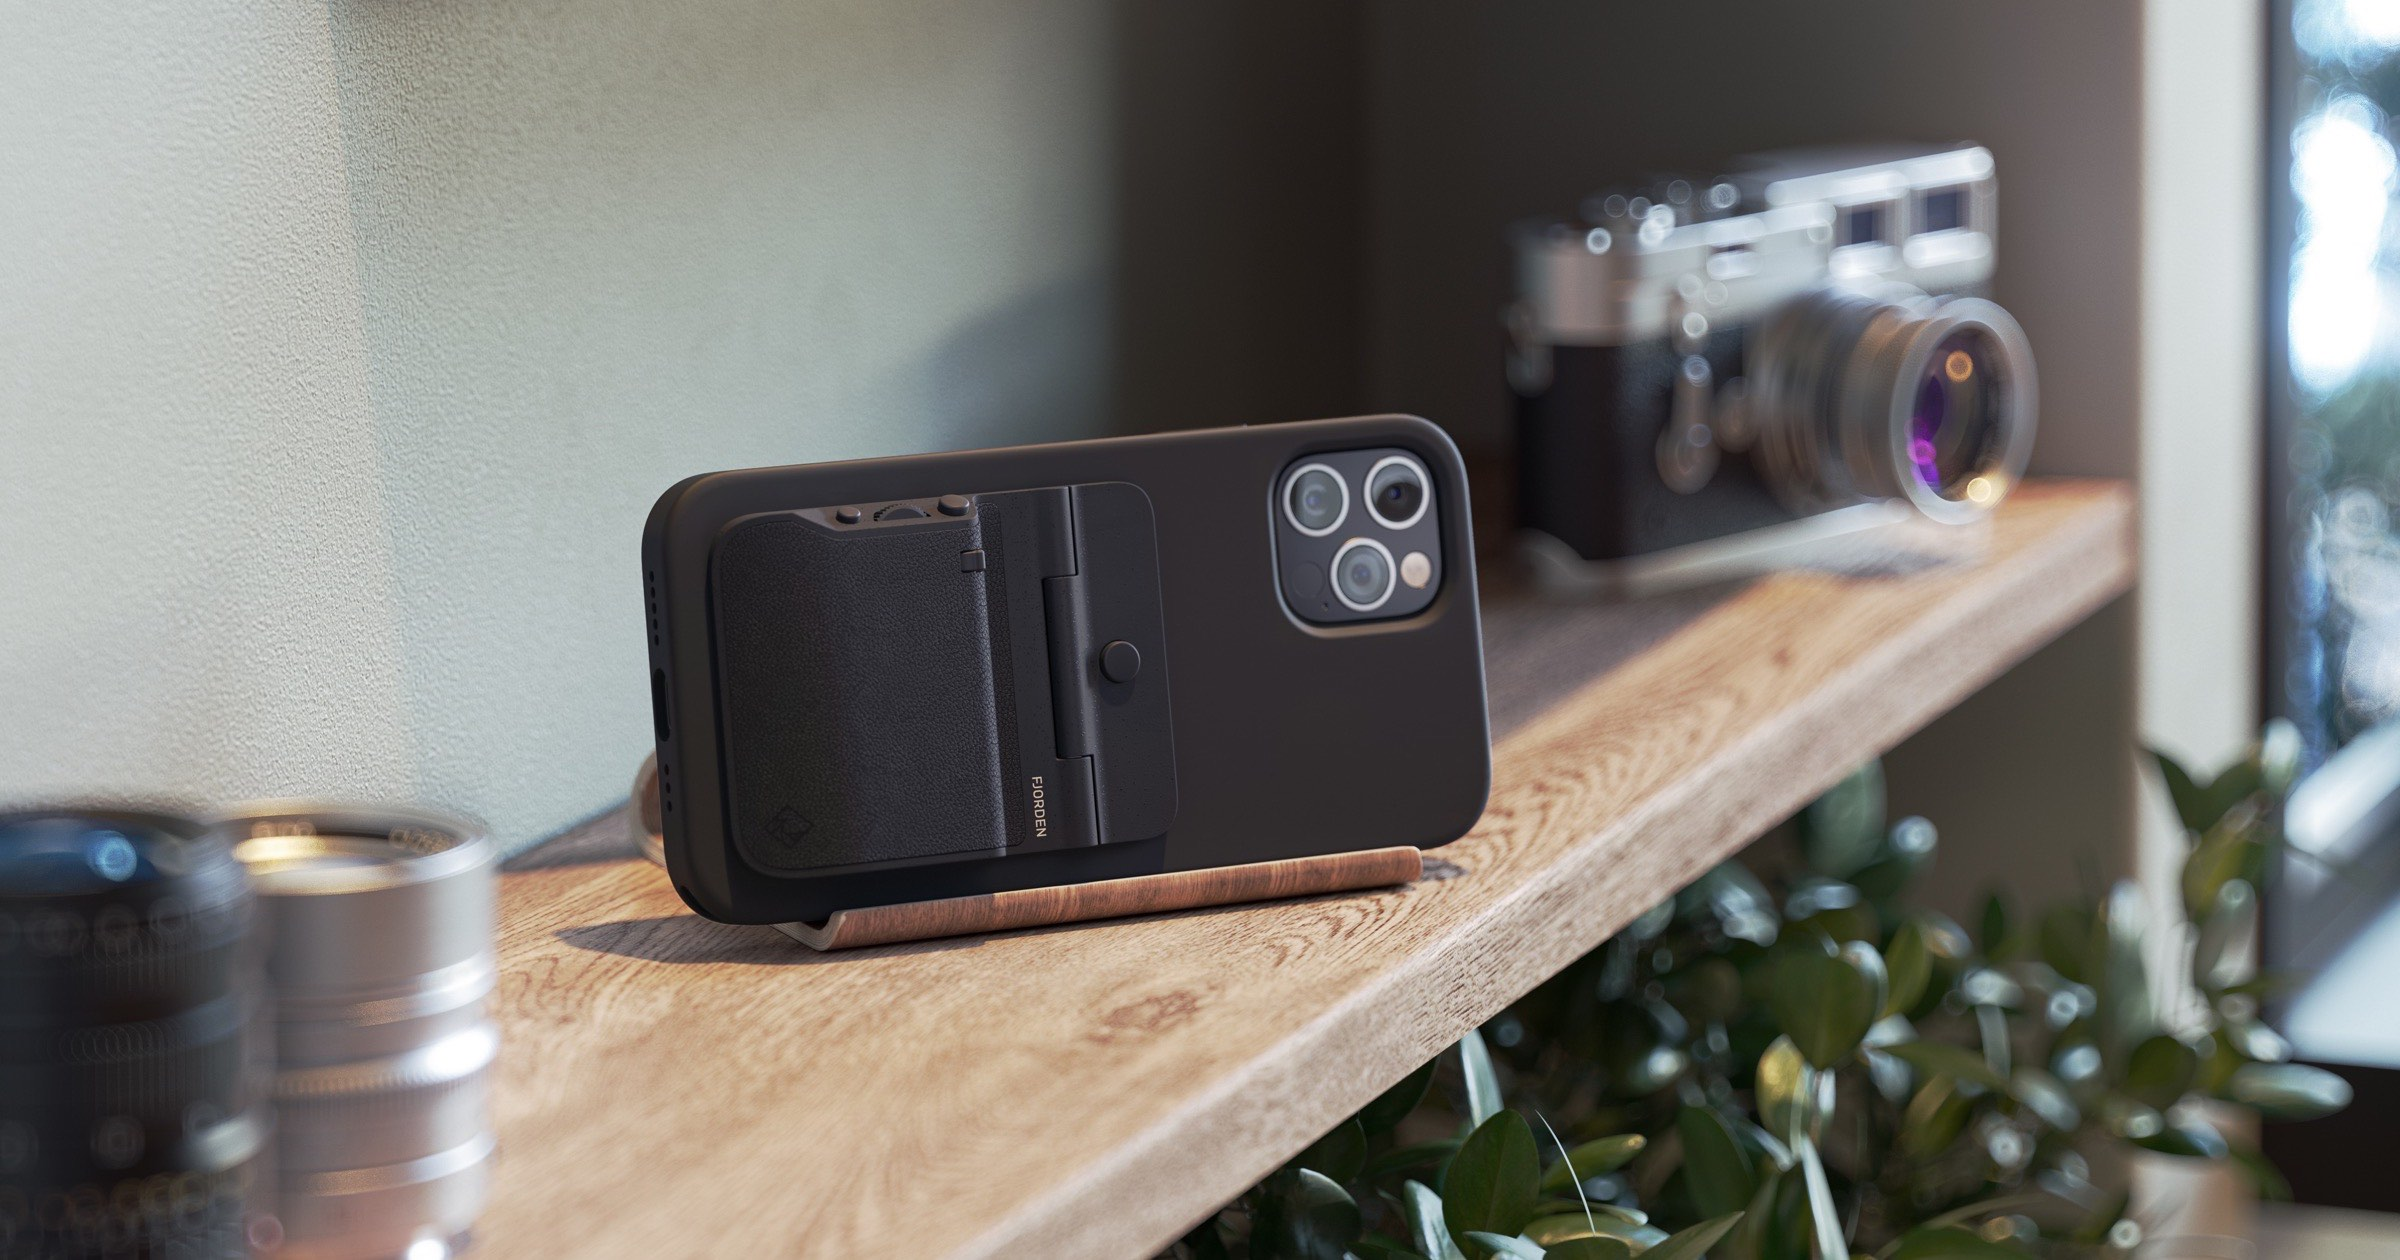 Fjorden iPhone Camera Grip Launches on Kickstarter